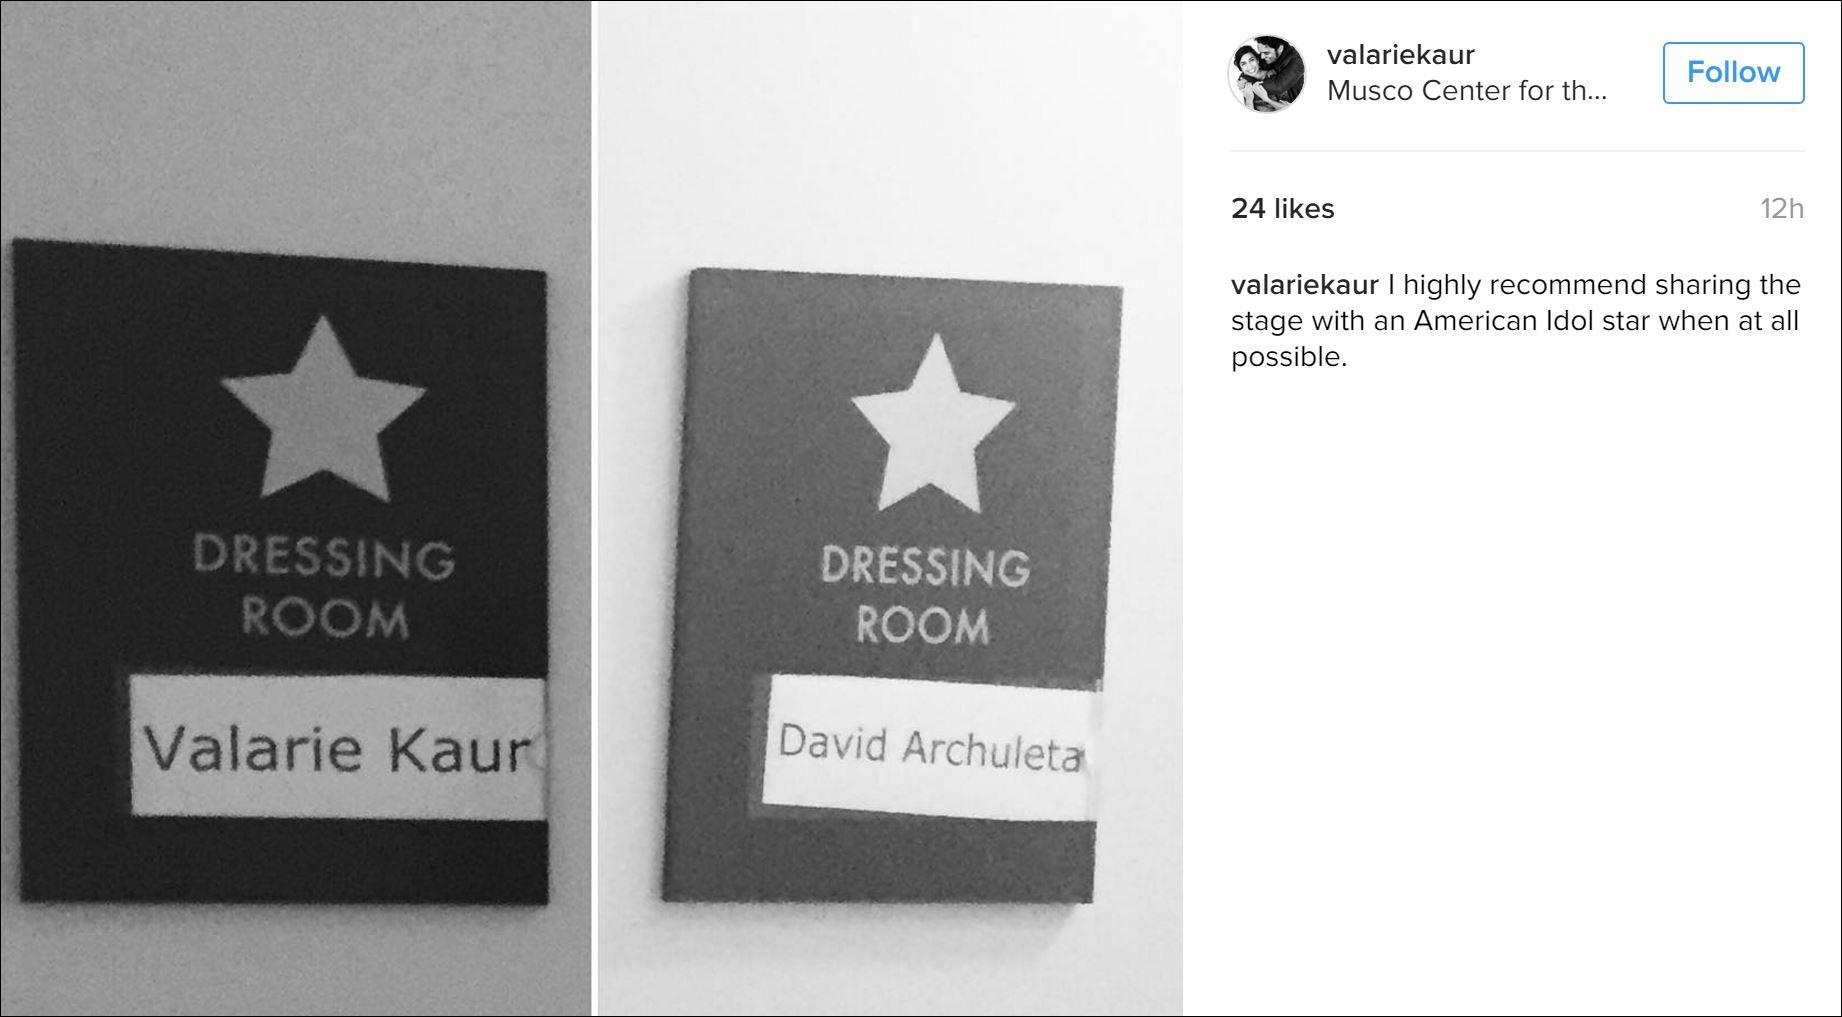 david dressing room